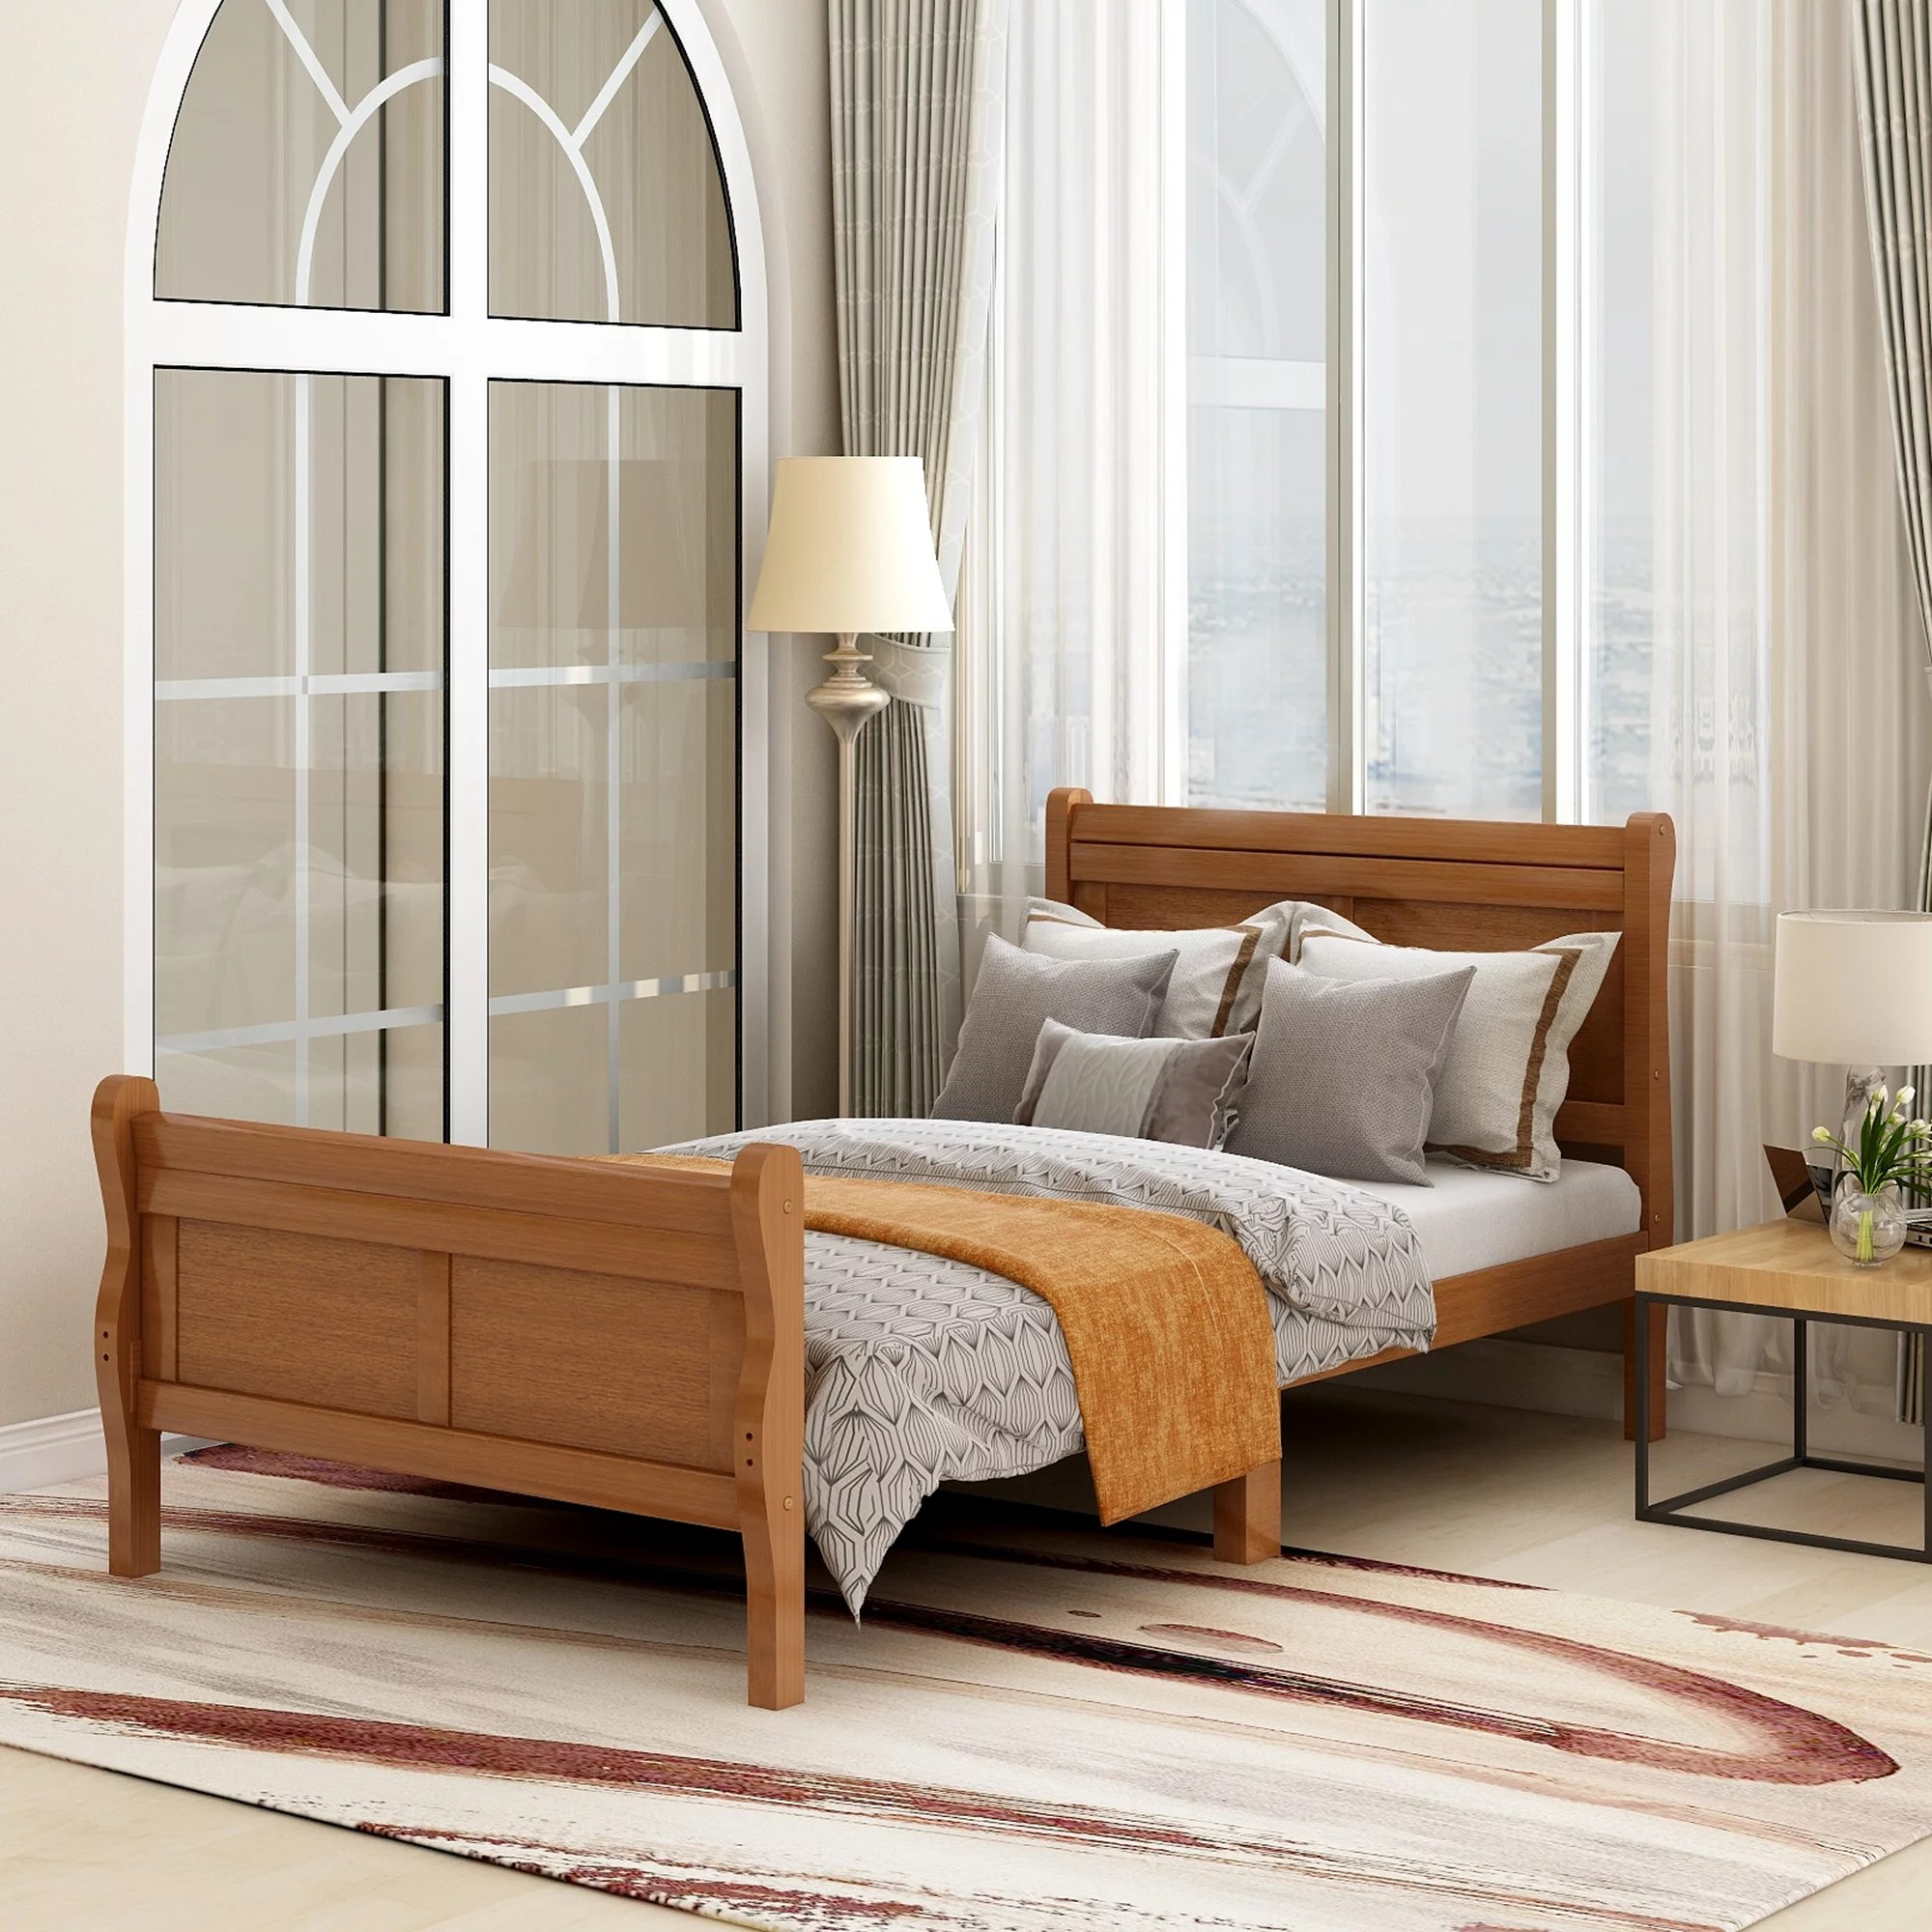 clearance twin platform bed frame heavy duty wood twin on walmart bedroom furniture clearance id=72030